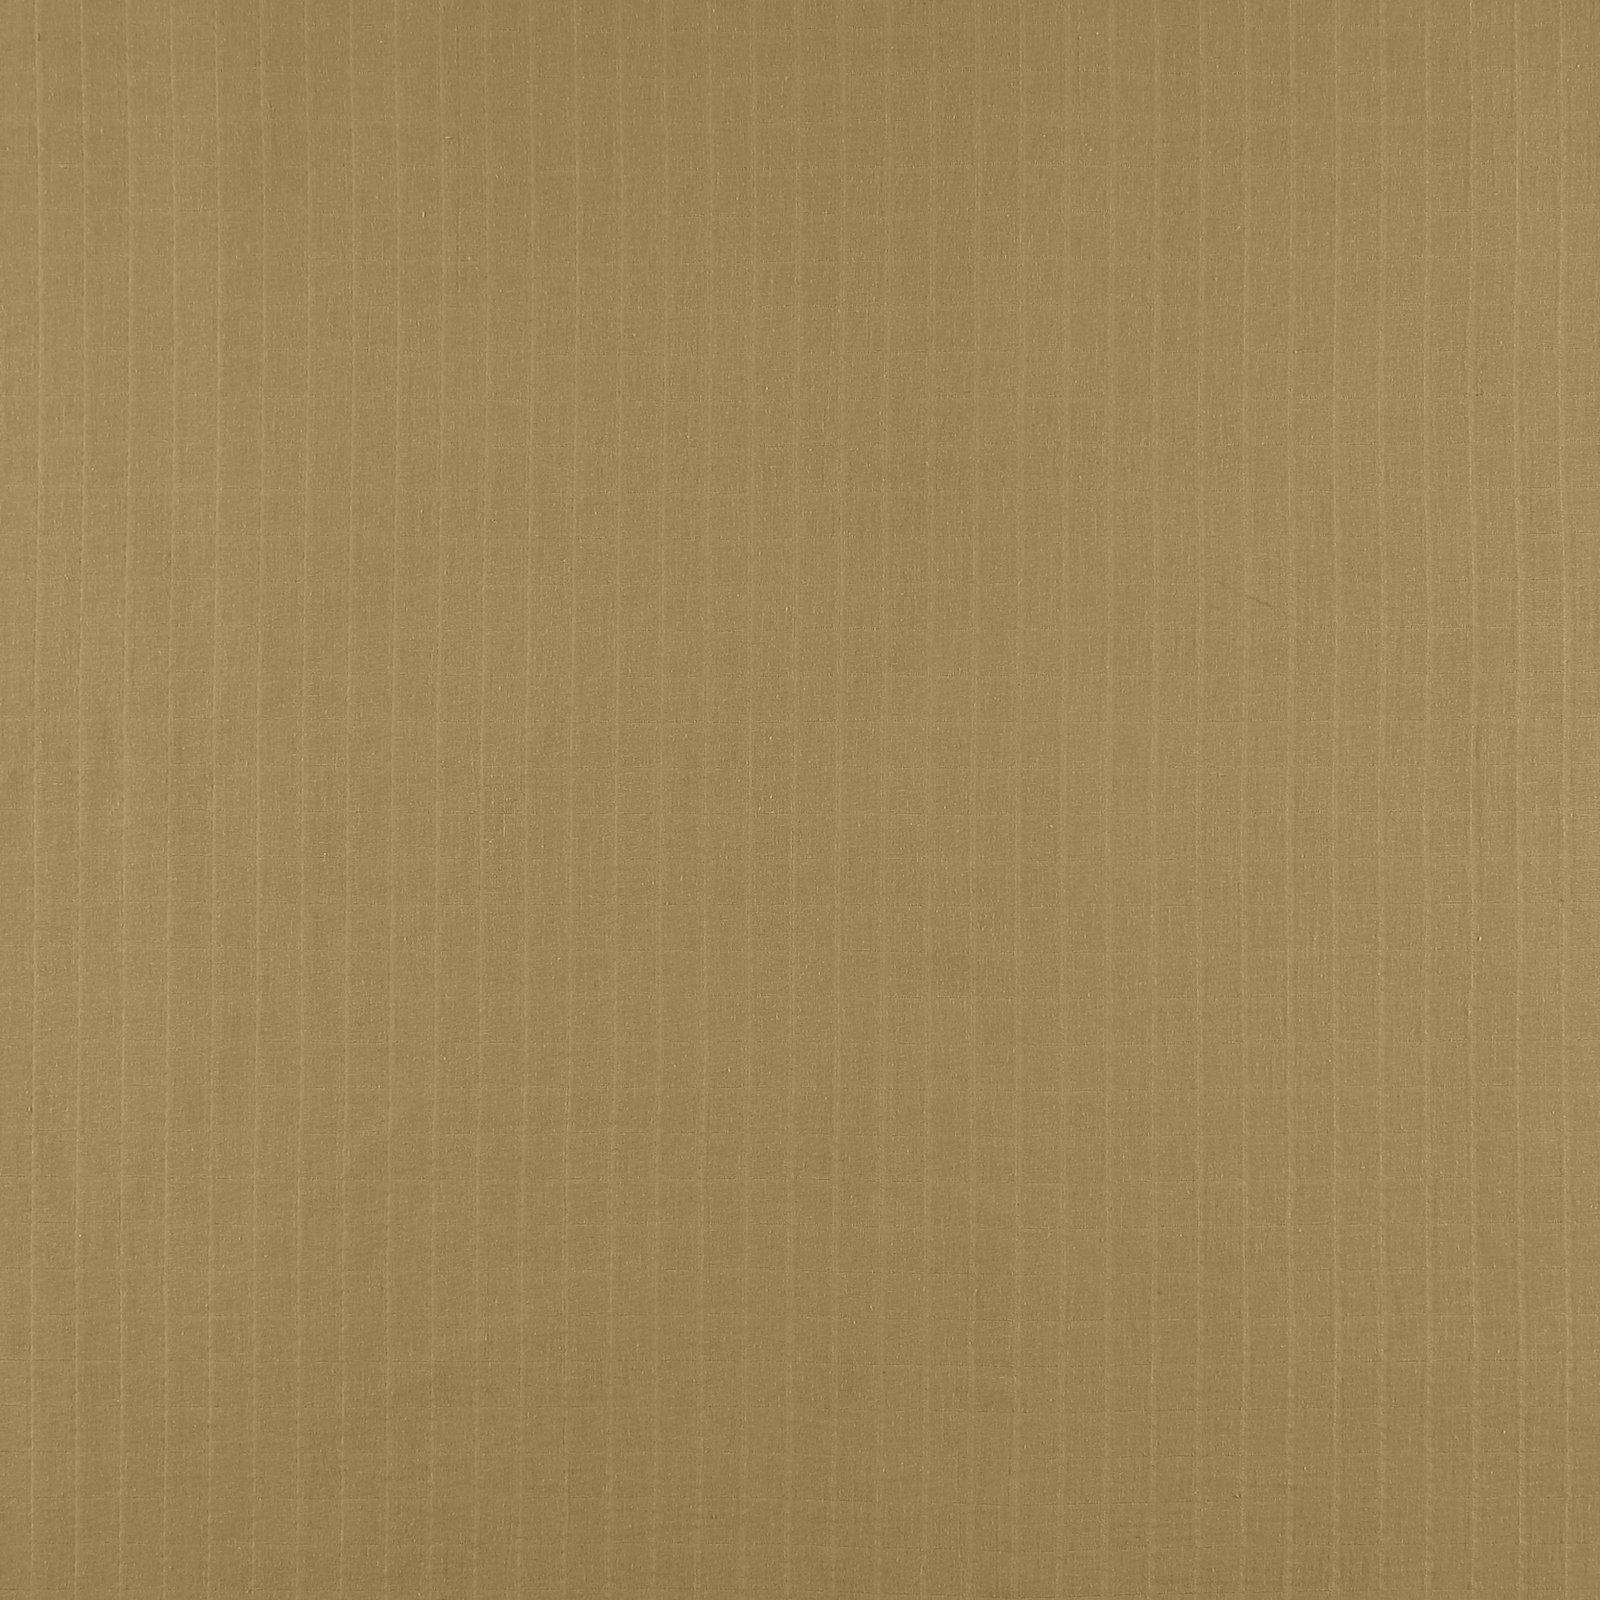 Muslin light khaki 501893_pack_solid